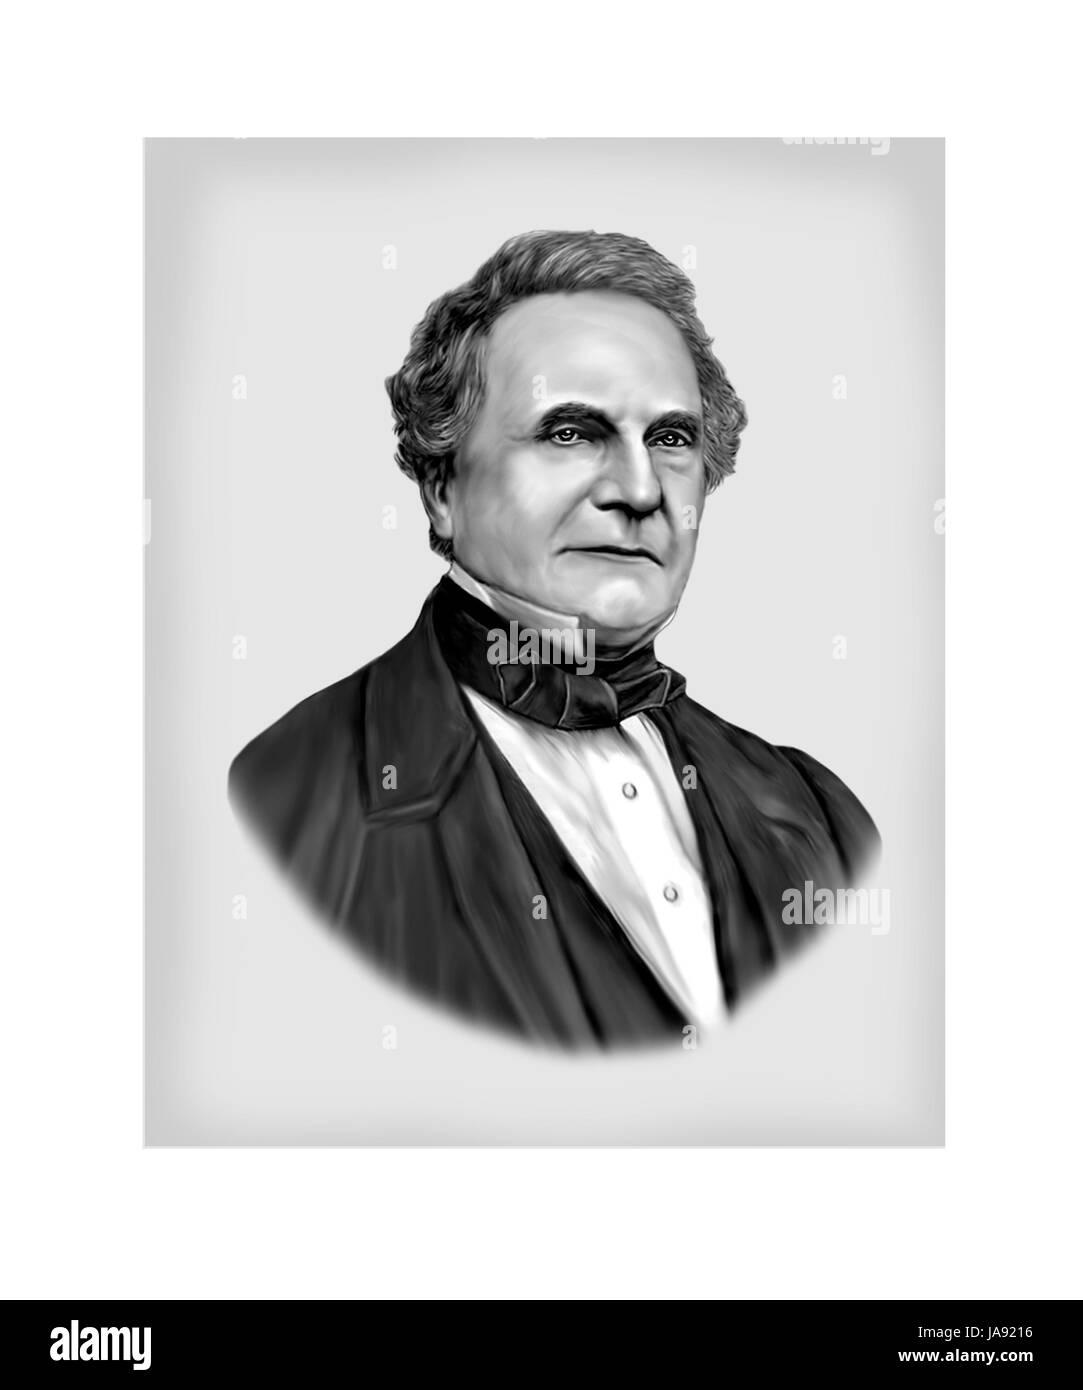 Charles Babbage, 1791 - 1871, Mathematician, Mechanical Engineer, Polymath - Stock Image